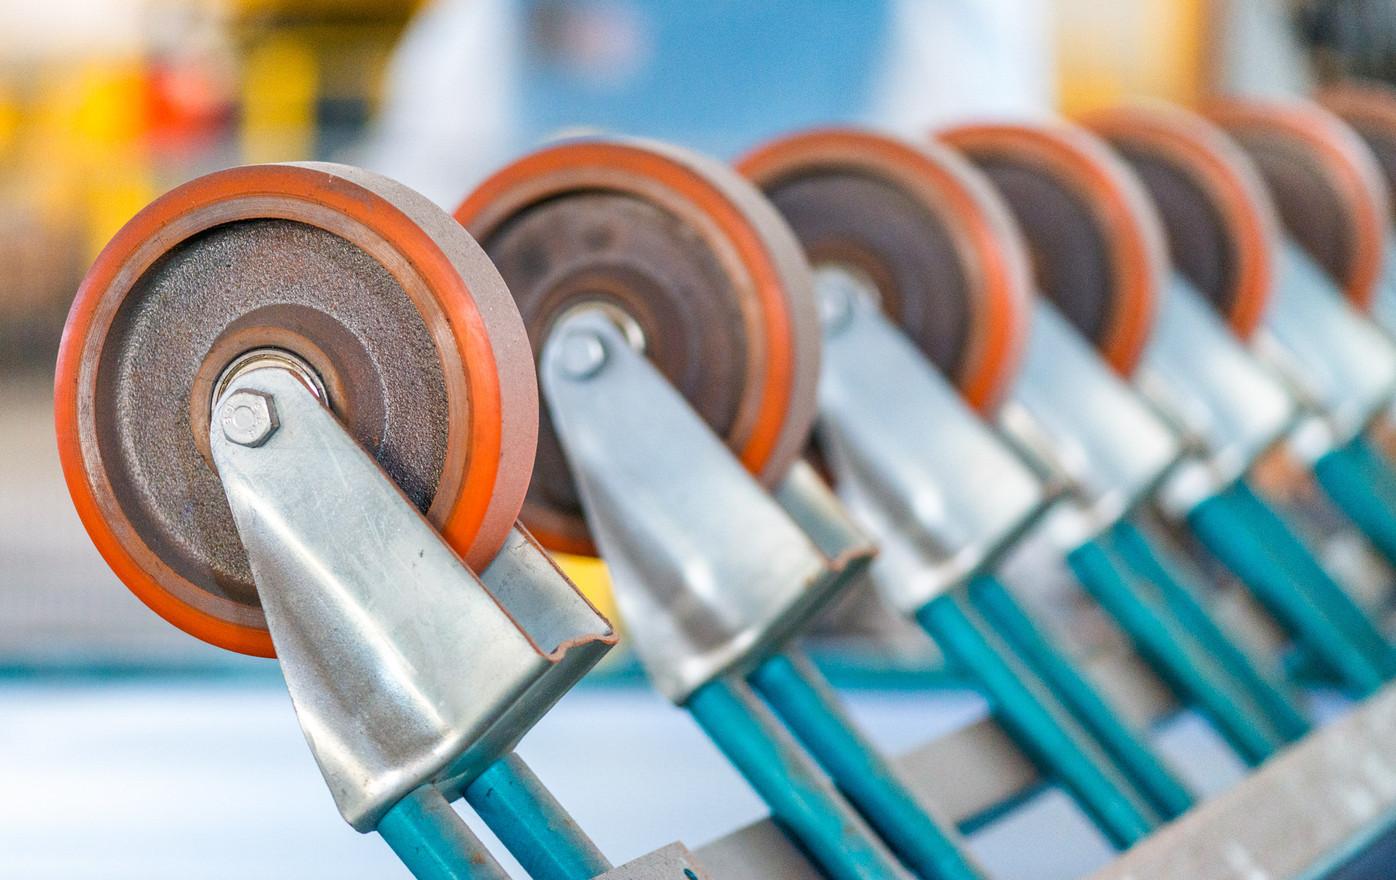 Rotating wheels in industrial environment